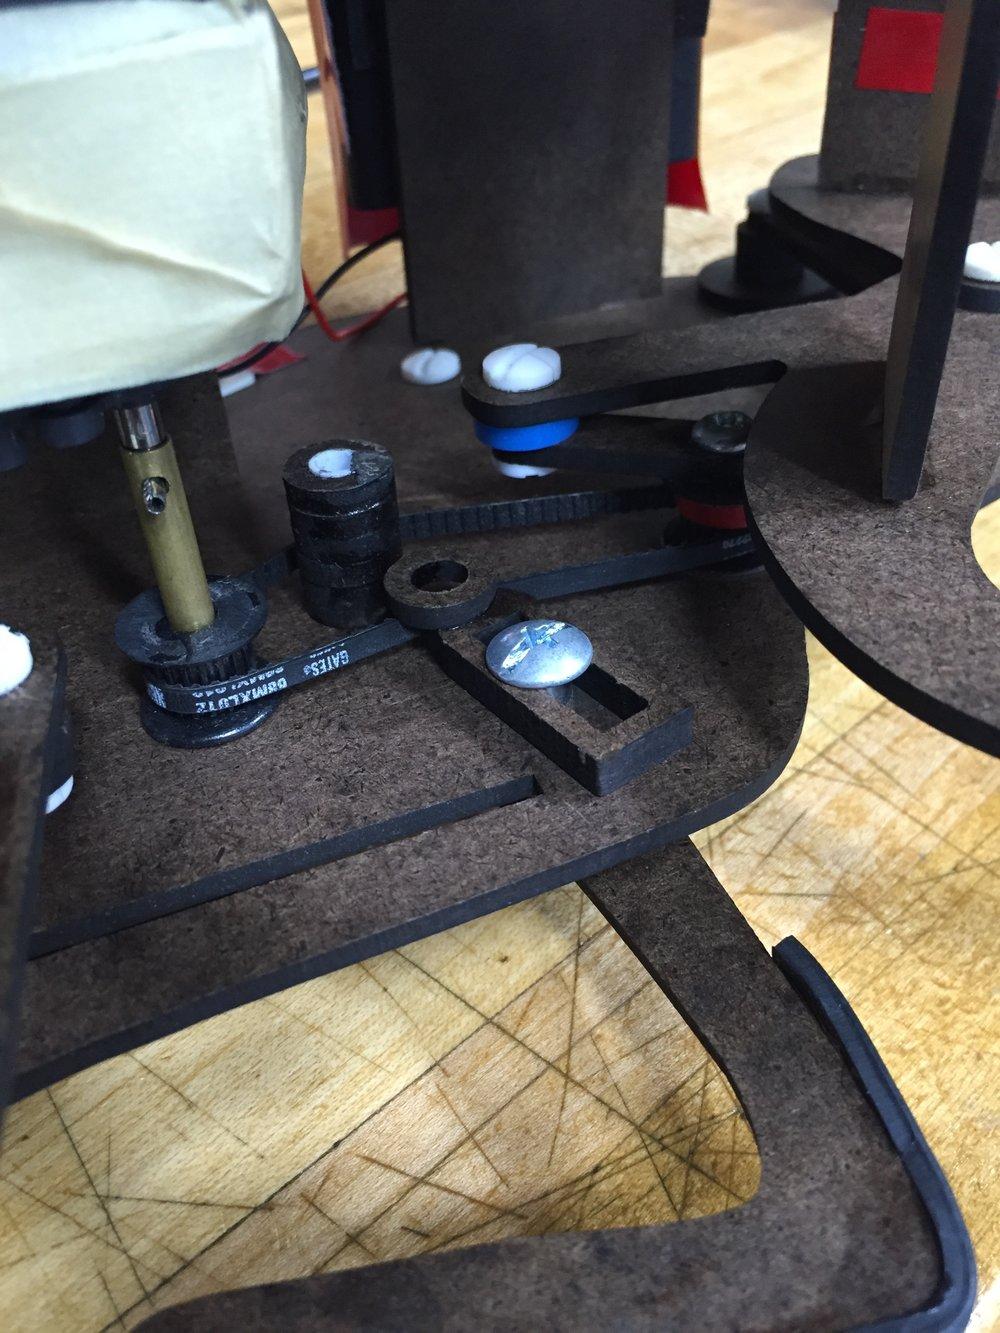 Hind leg belt drive system.